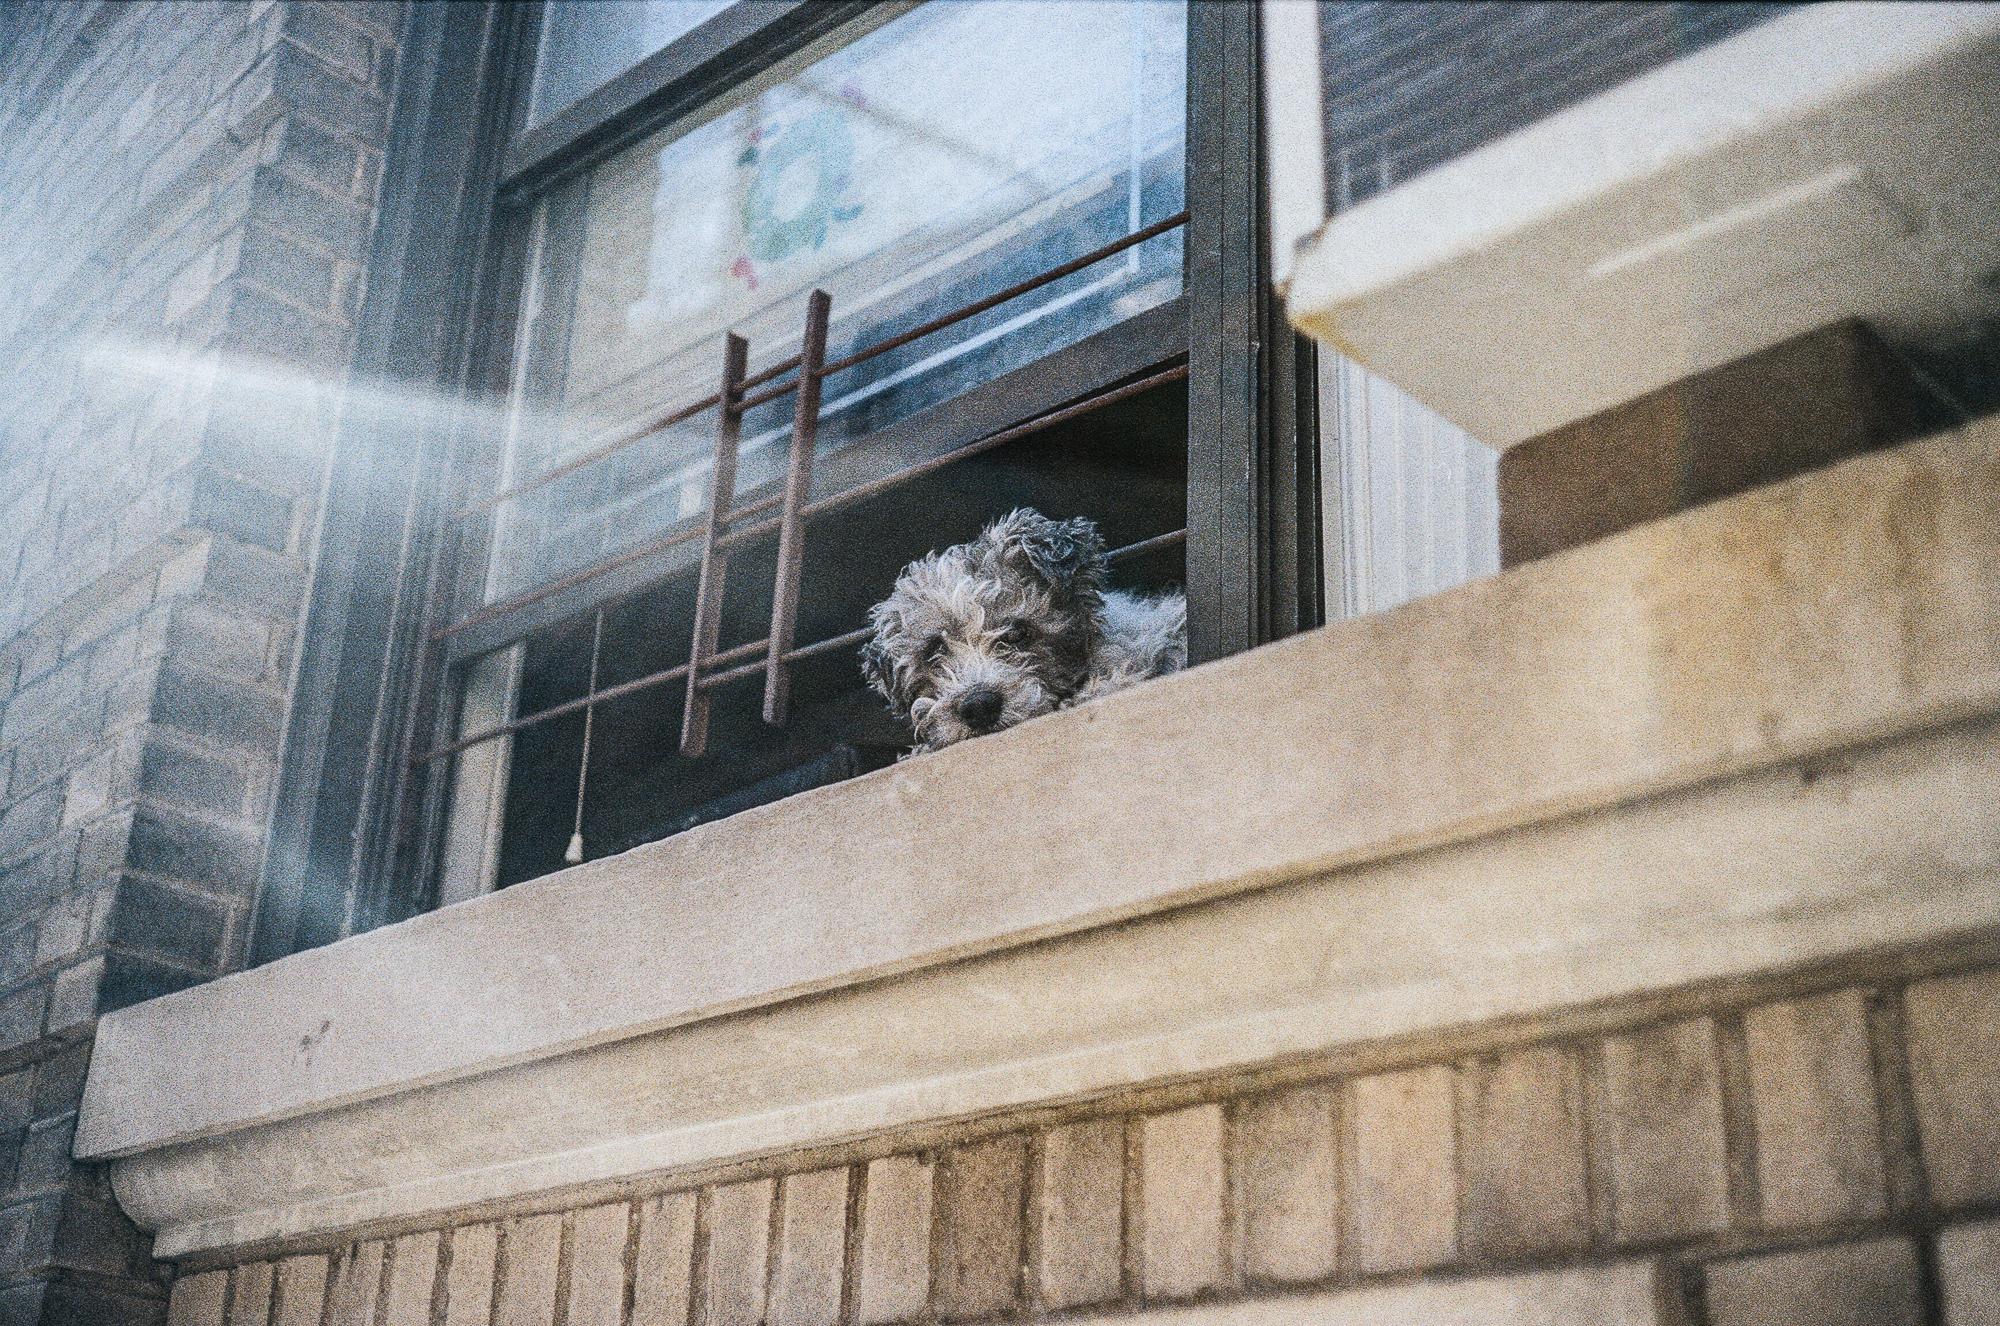 A curious puppy in Washington Heights.Canonet QL17, Kodak Gold 200.